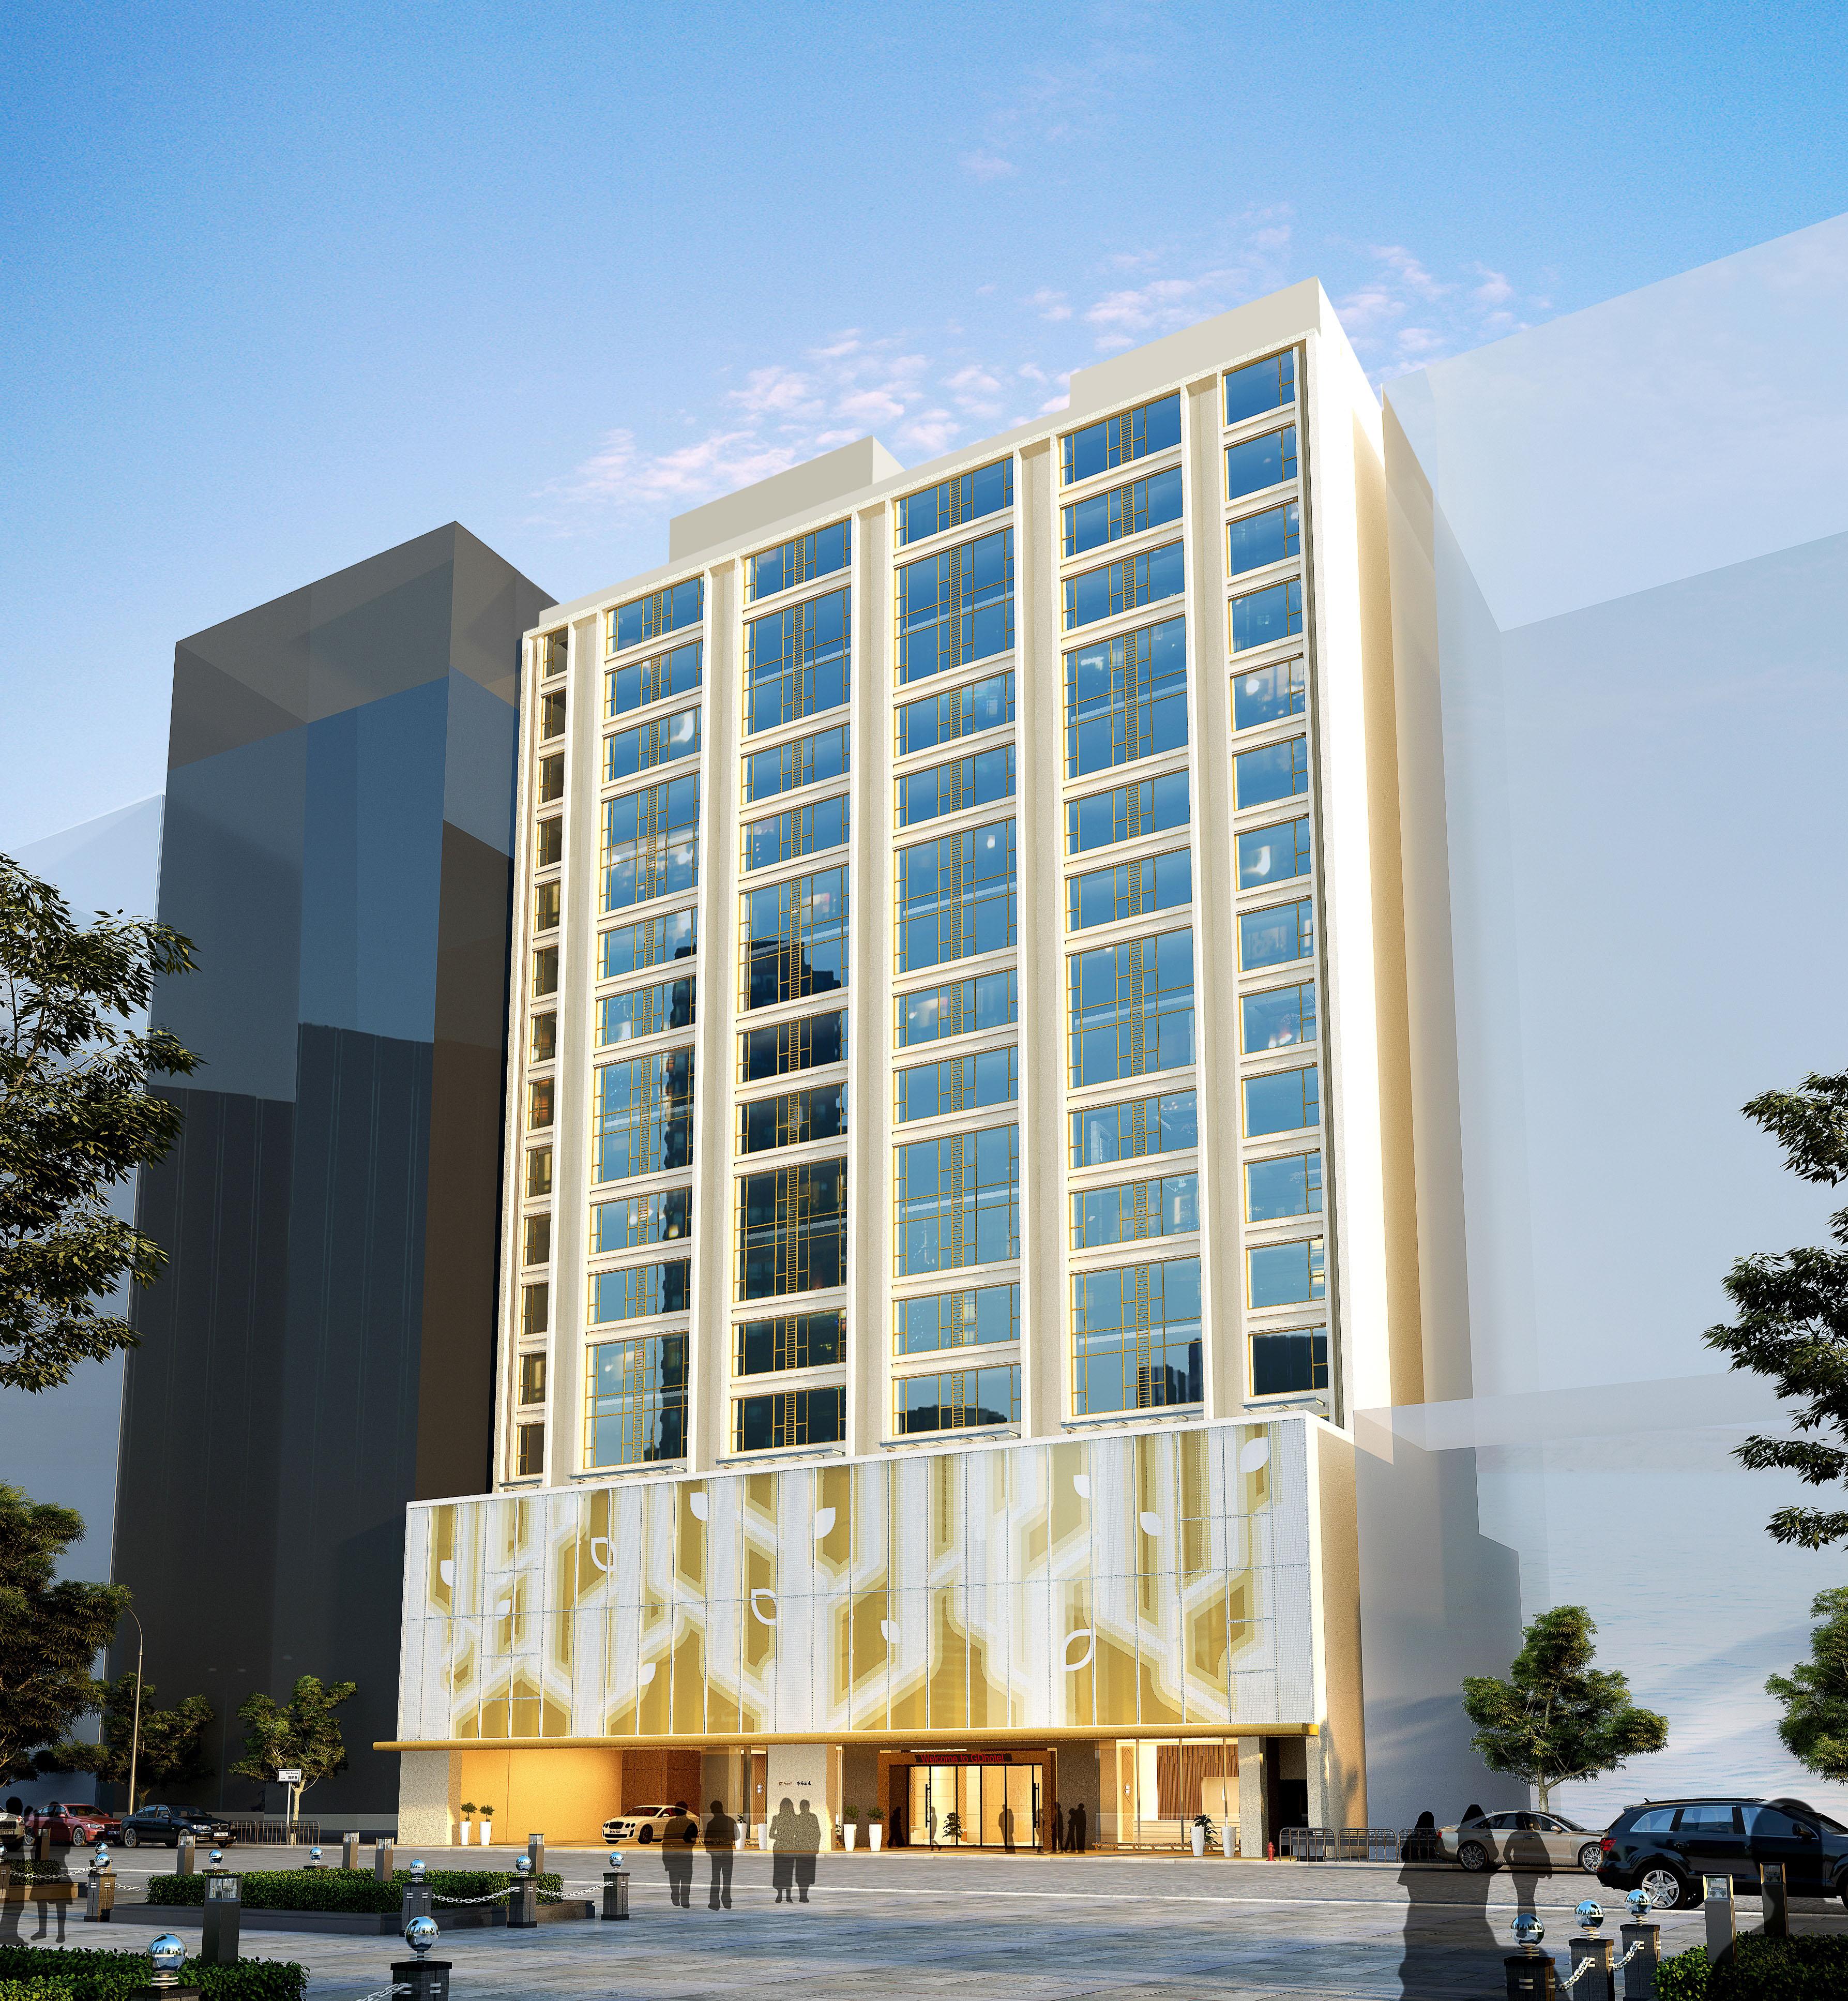 Gdh Hotel, Yau Tsim Mong